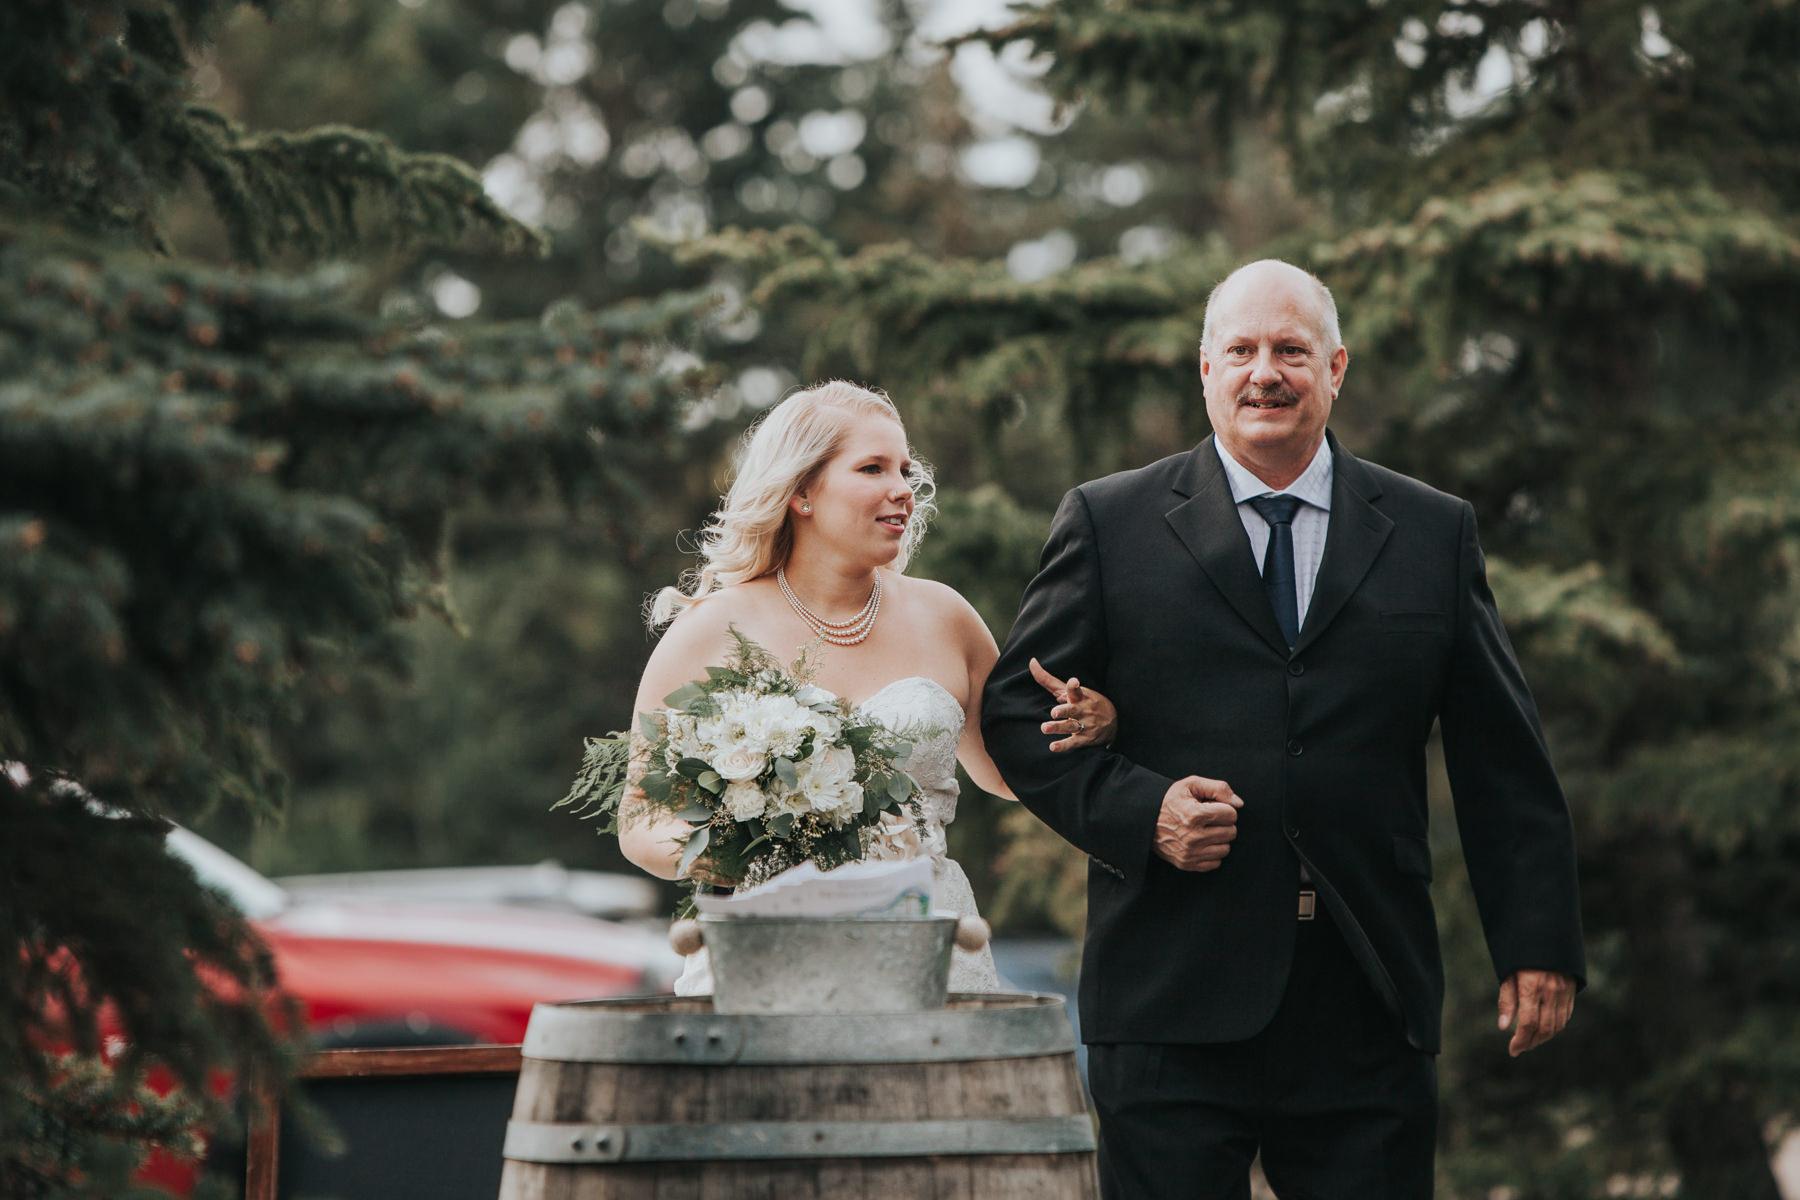 Vancouver wedding photographer Jess 7